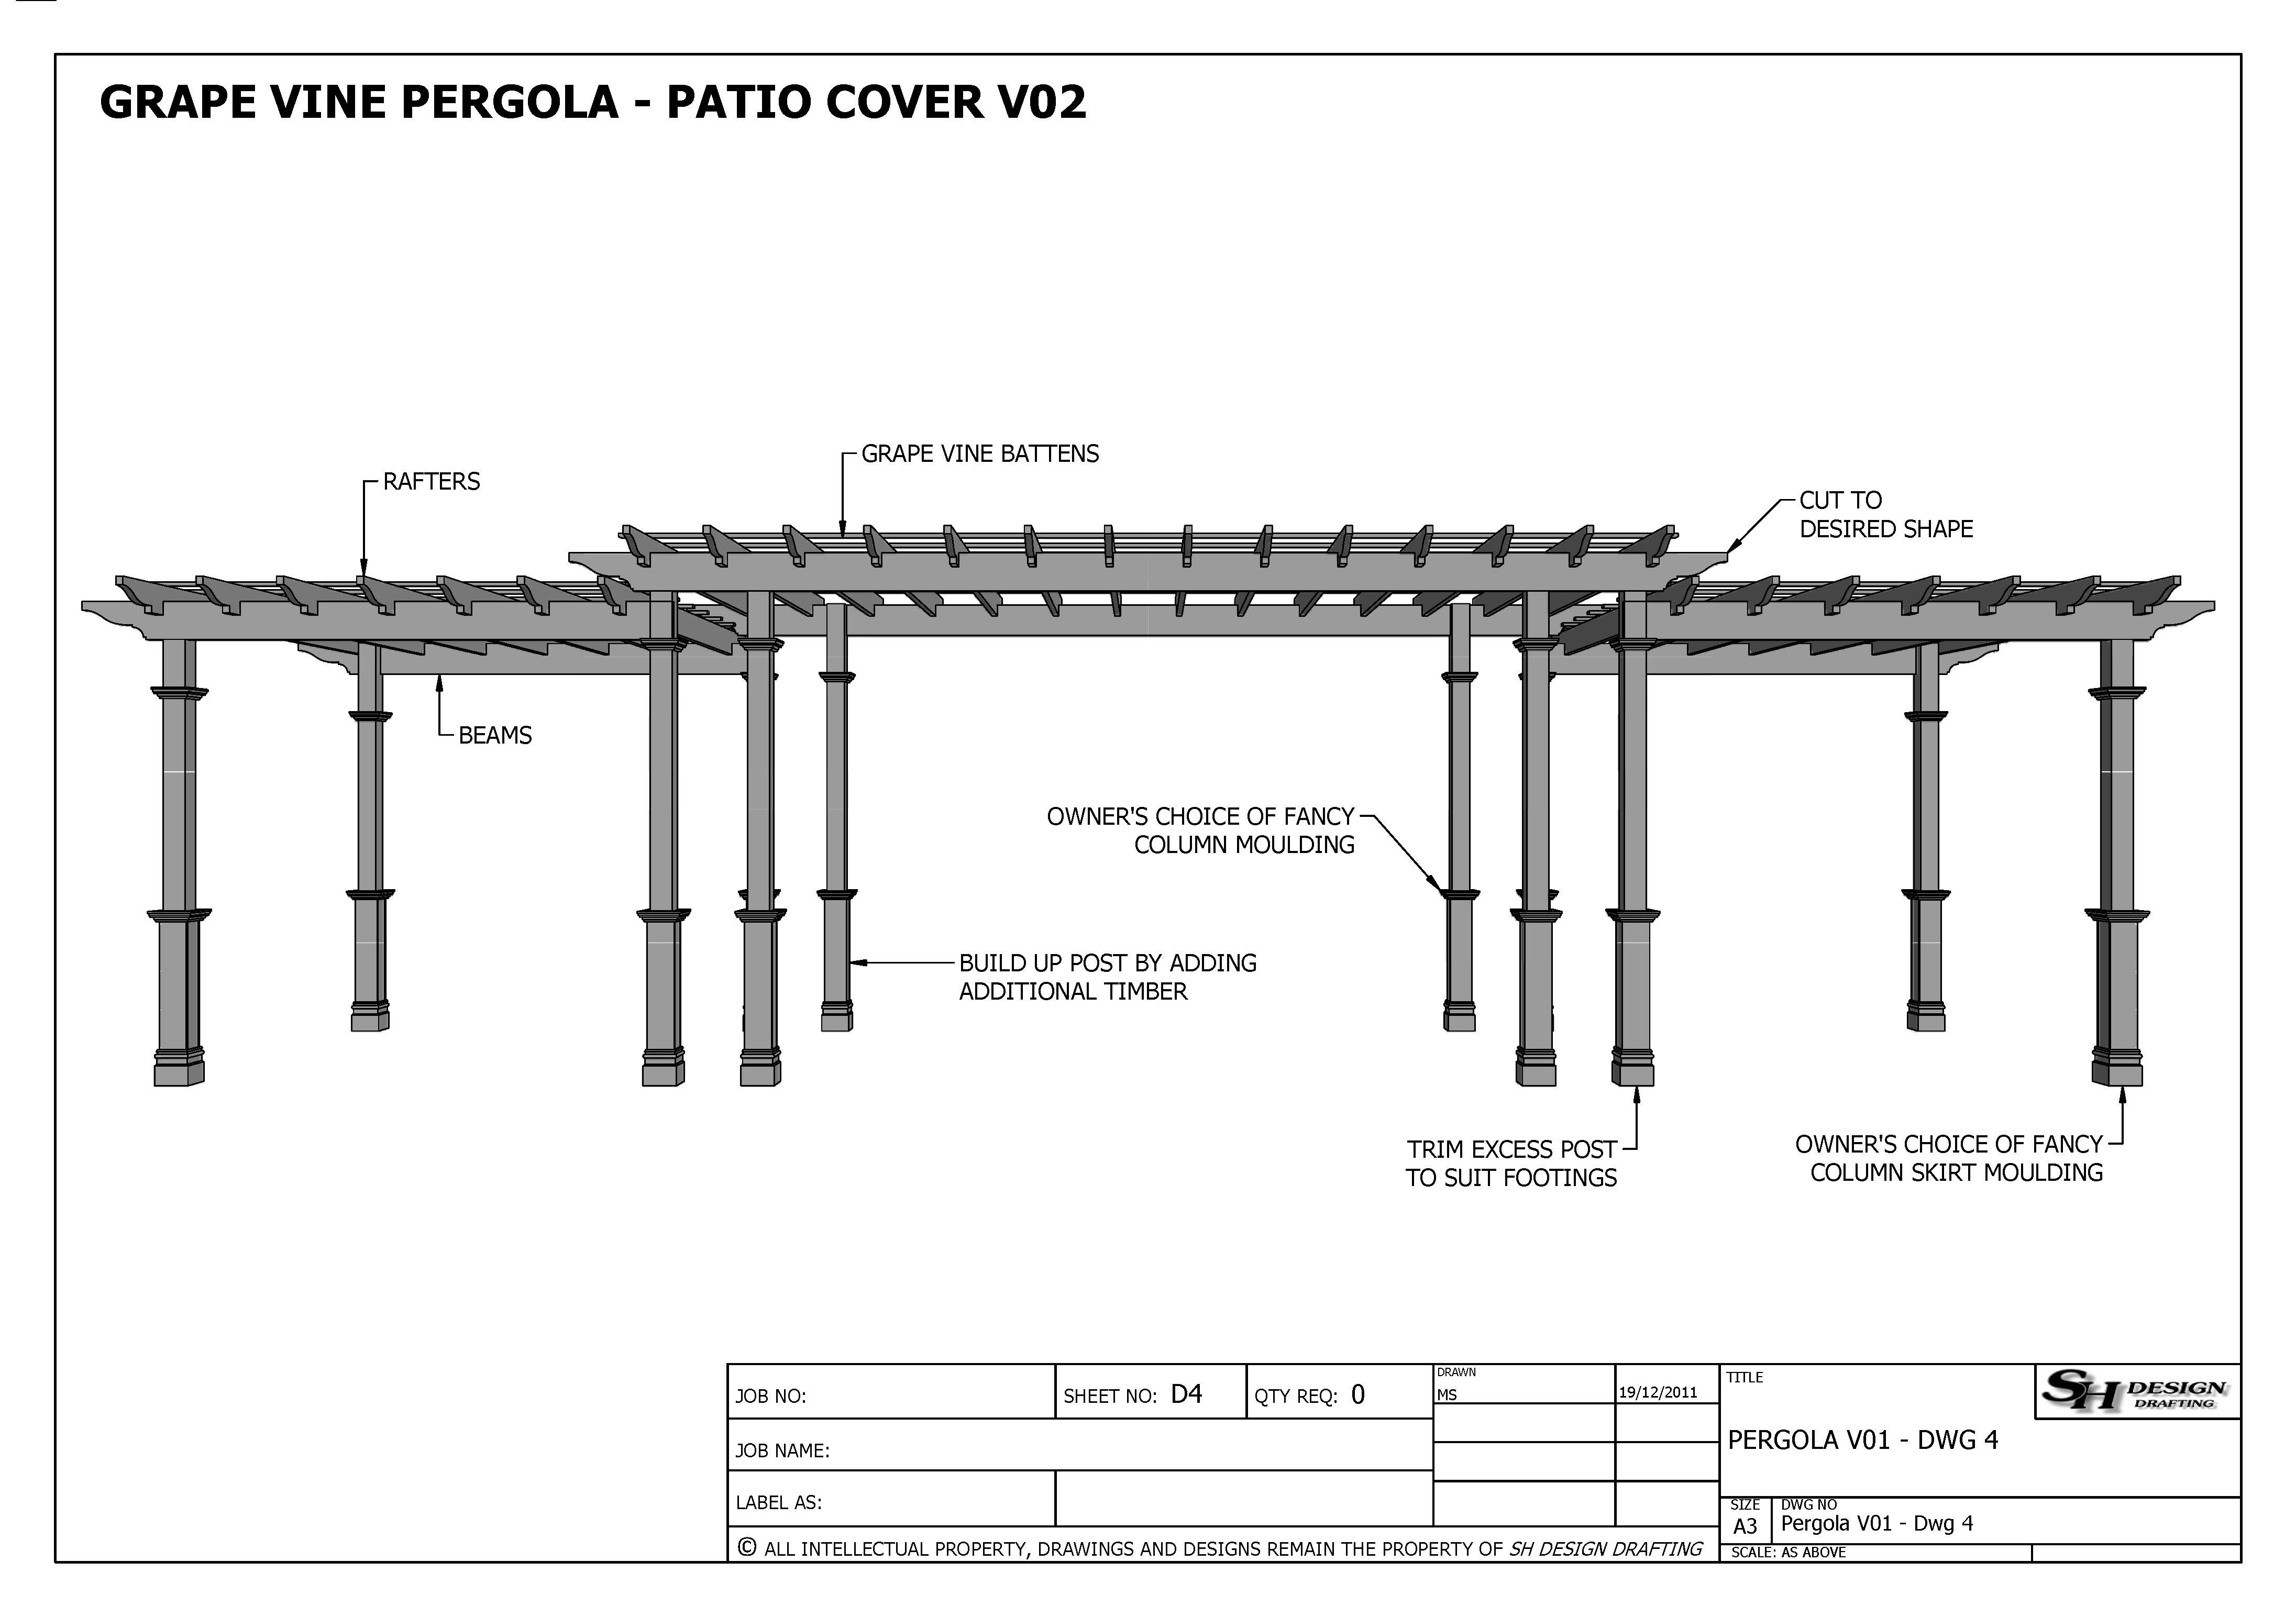 GRAPE VINE PERGOLA - OUTDOOR PATIO COVER - V2 Full ... on Patio Cover Decorating Ideas id=69169